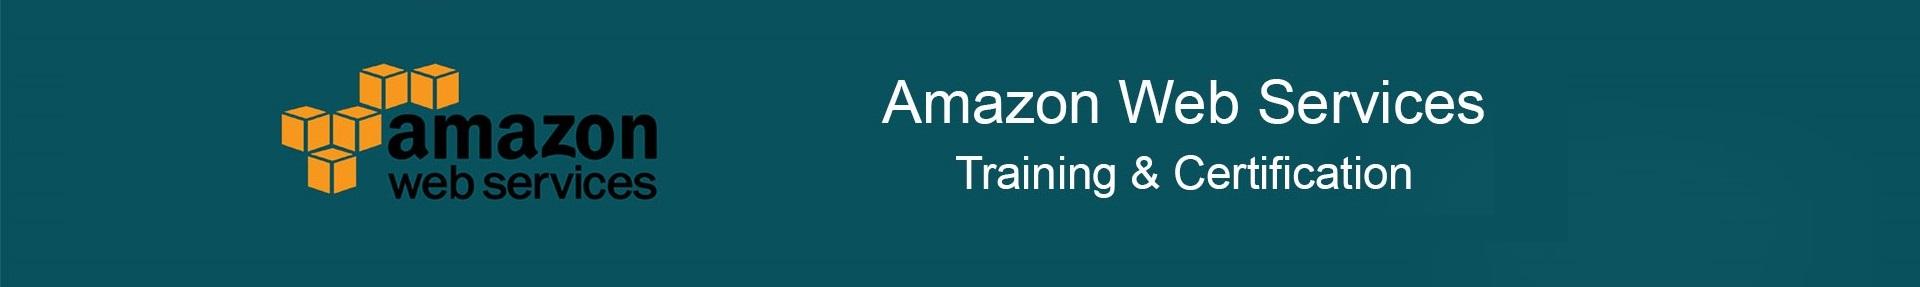 AWS Certification - AWS Training - AWS Boot Camp - Amazon Cloud